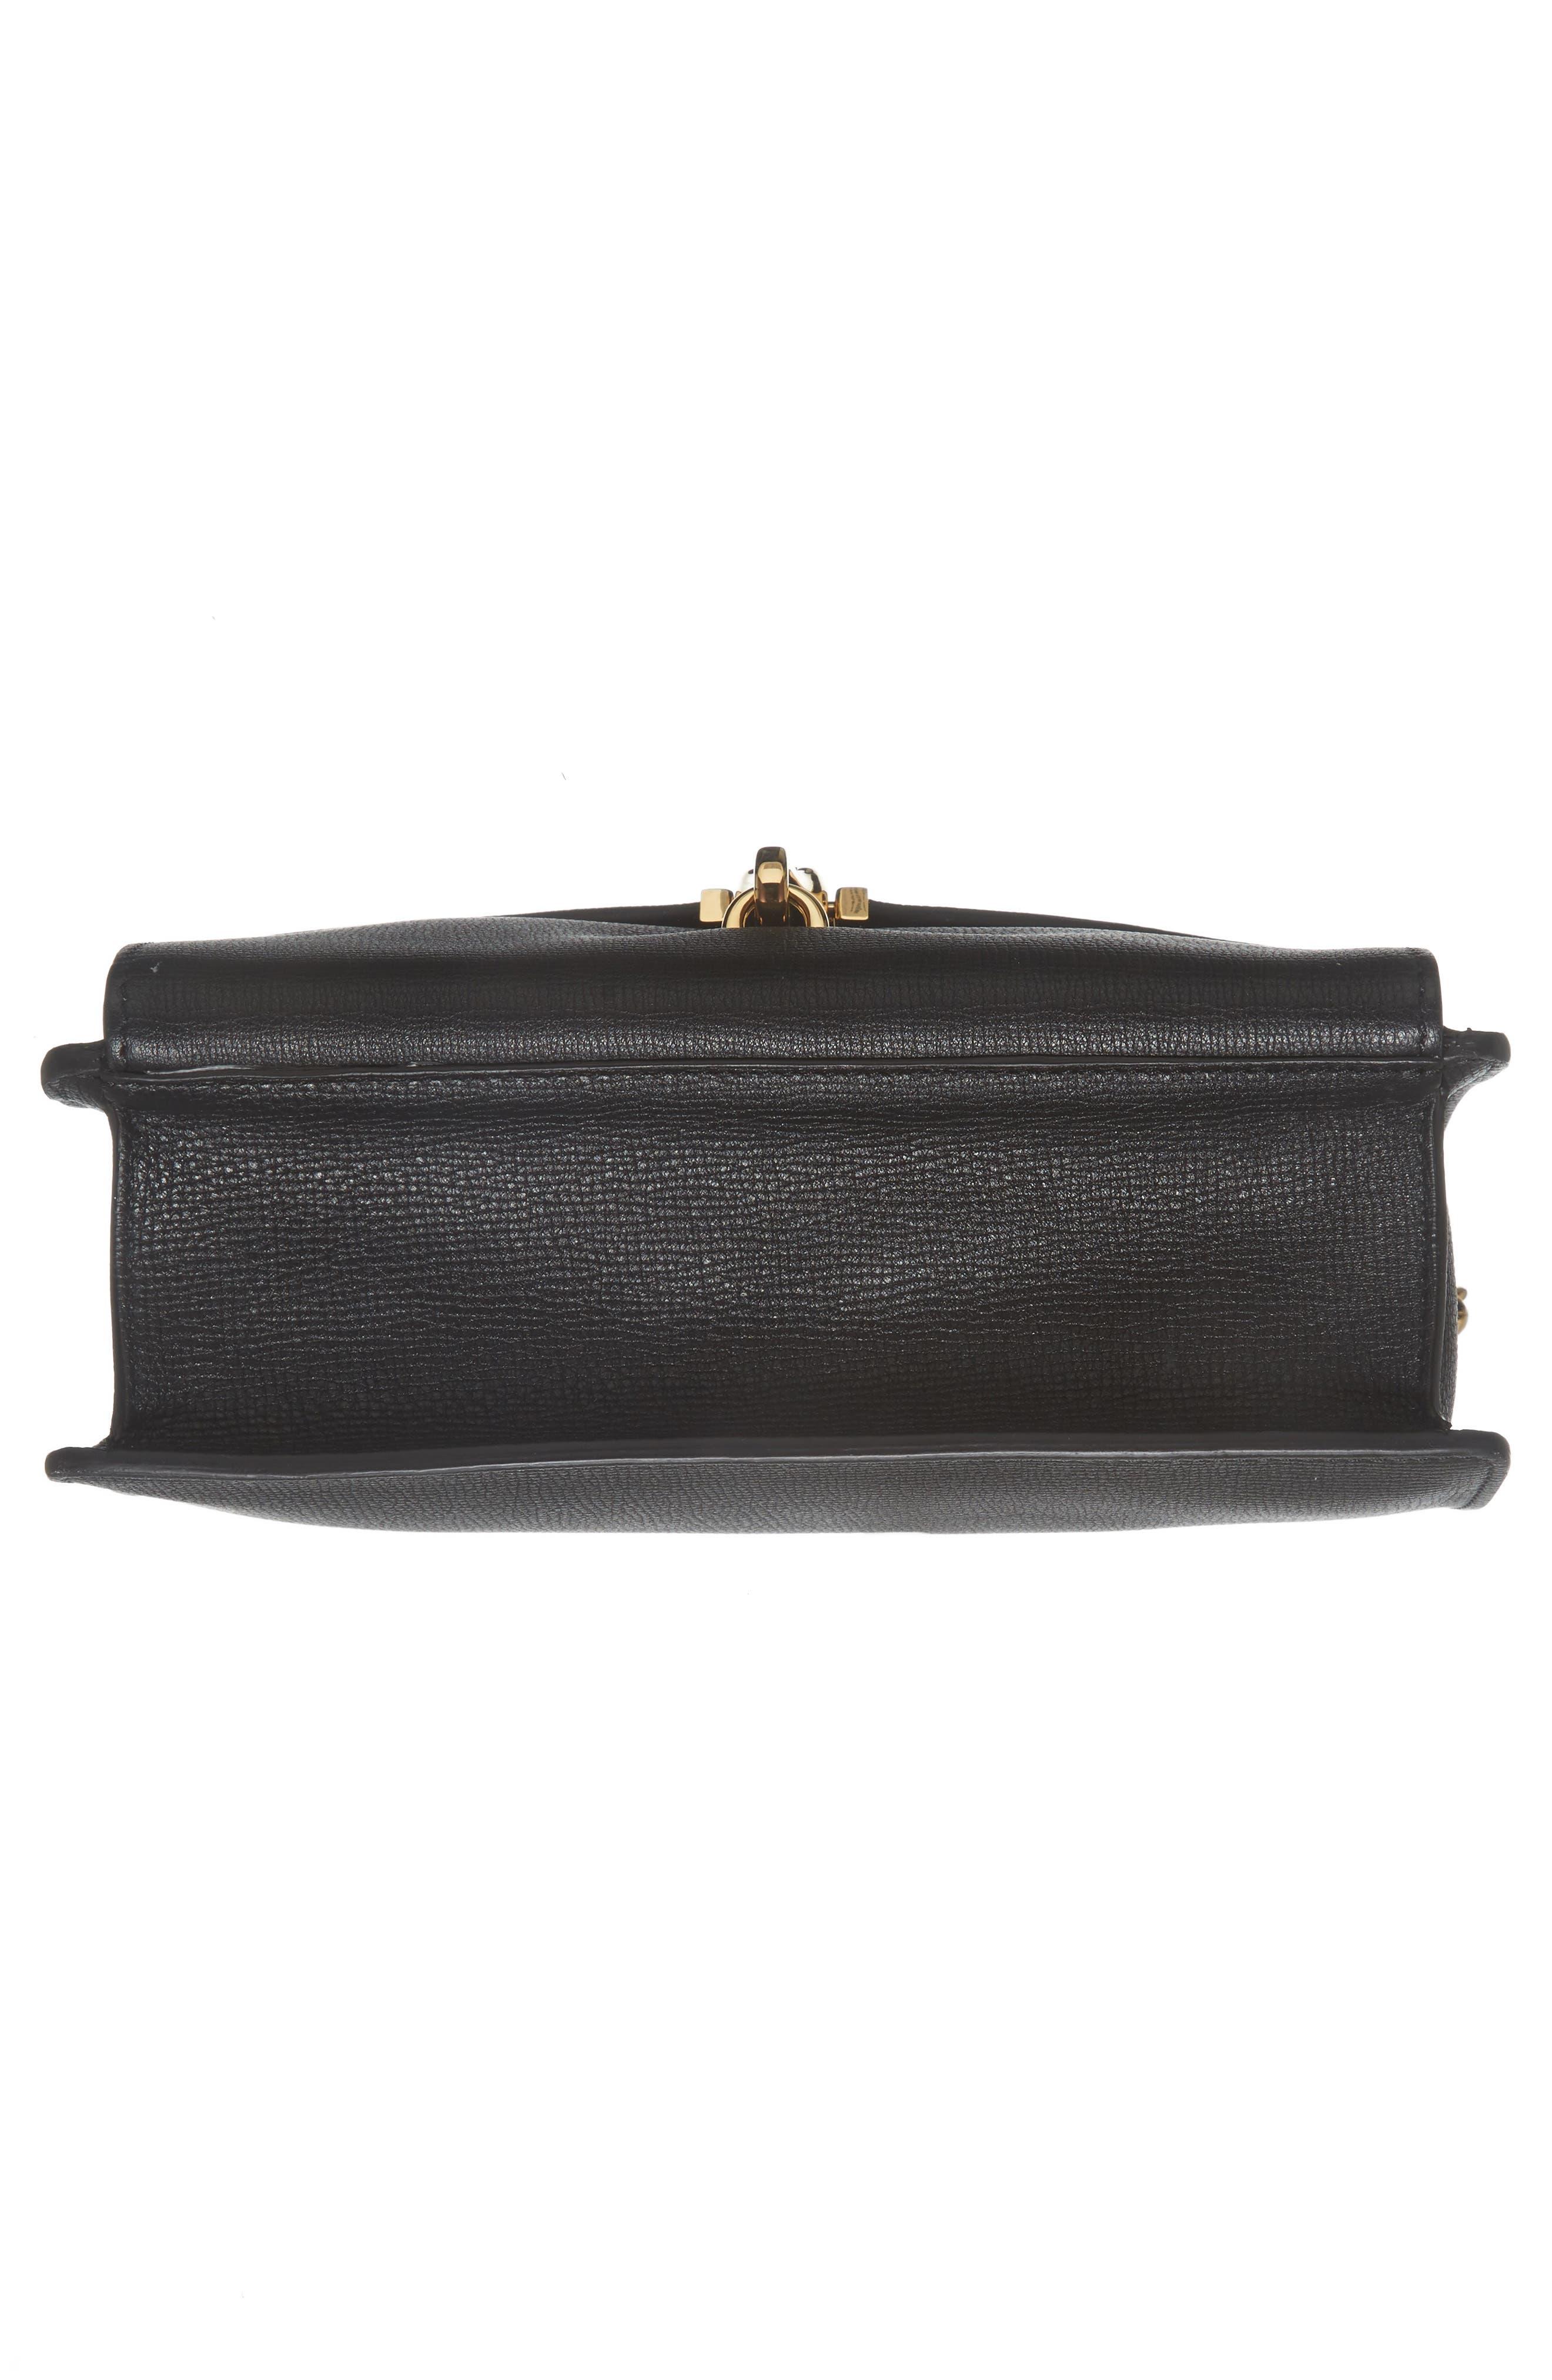 Macken Leather Crossbody Bag,                             Alternate thumbnail 6, color,                             001